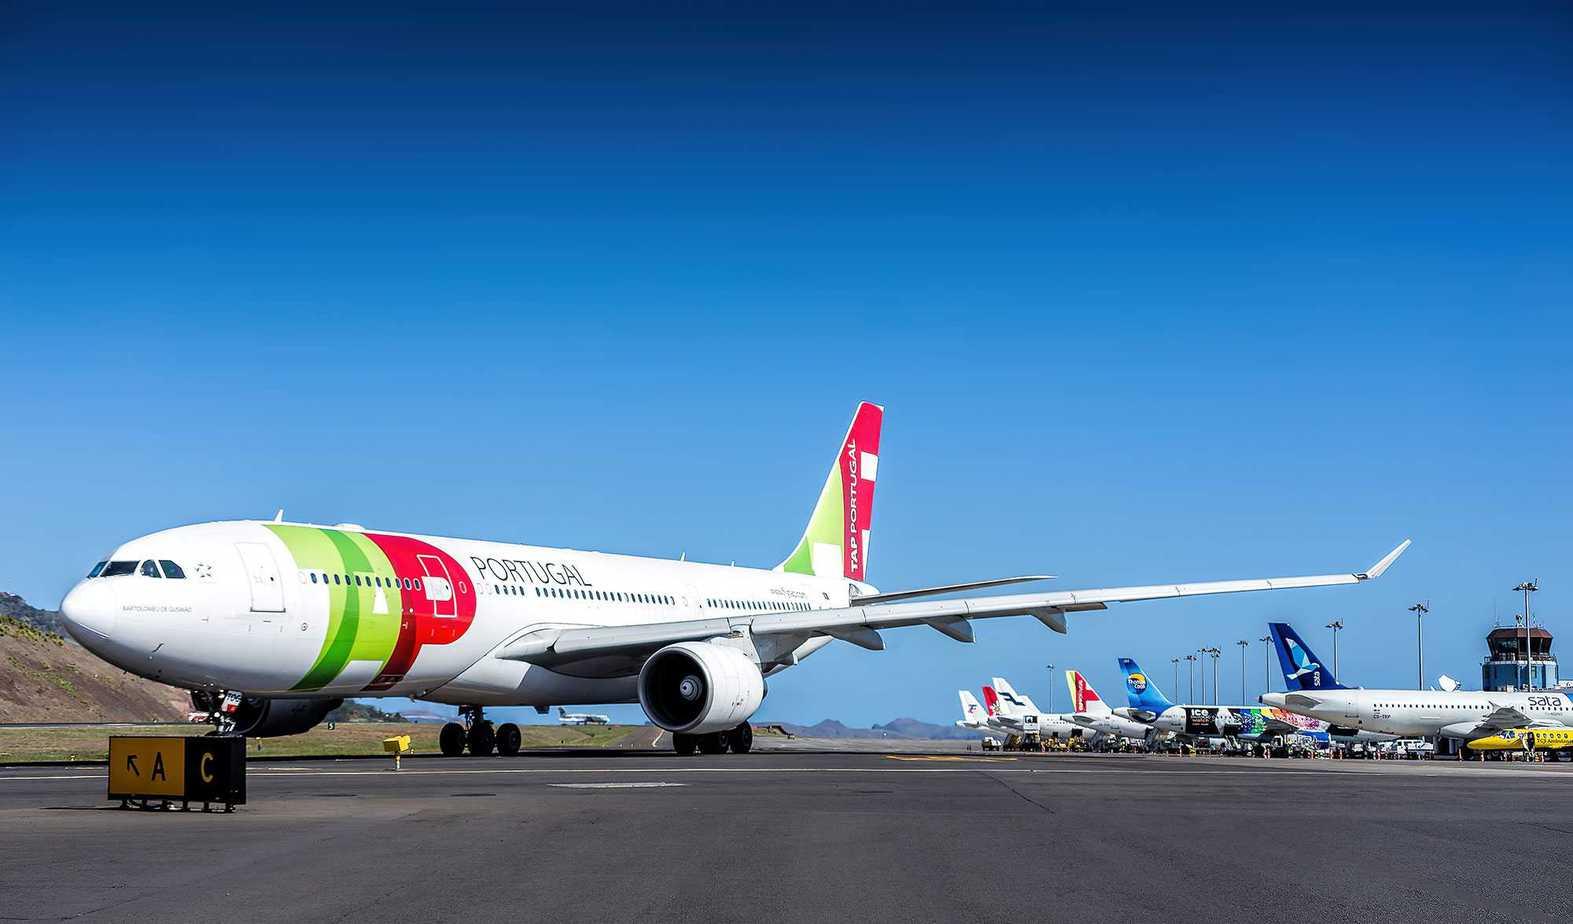 Cristiano Ronaldo Airport - Funchal